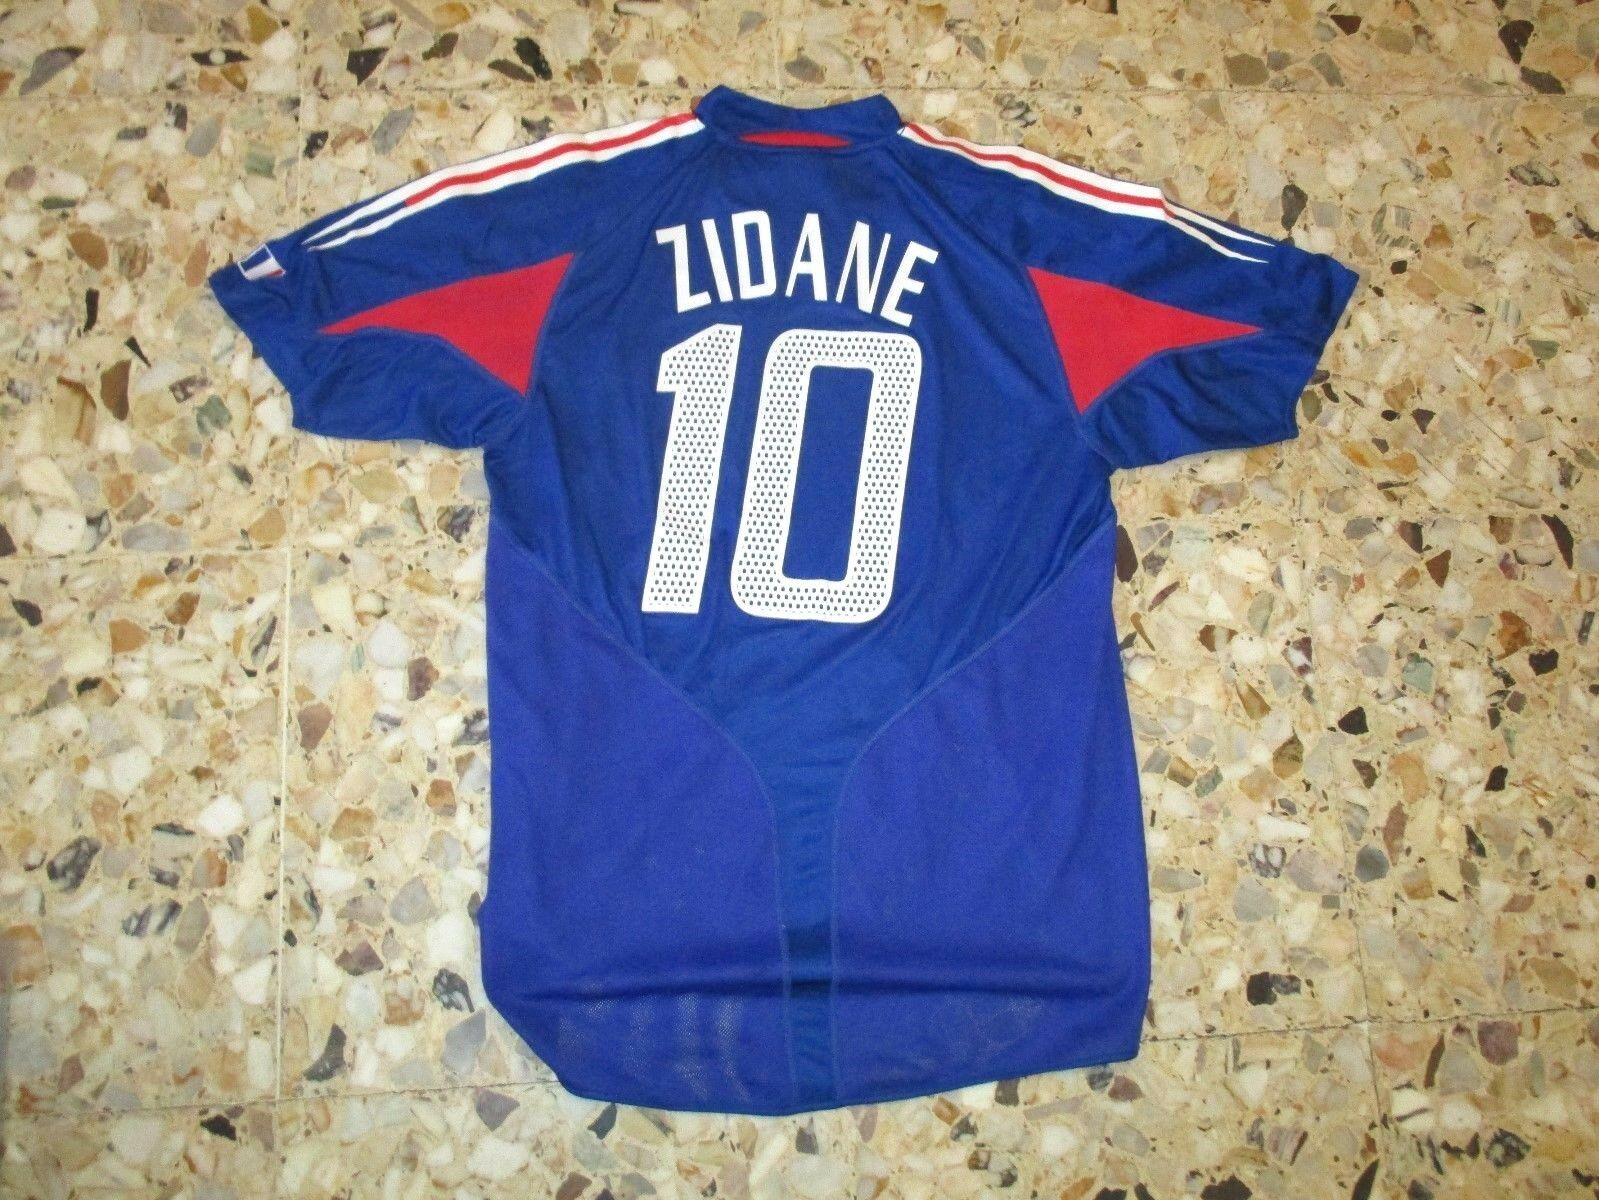 Maillot ancien trikot shirt jersey maglia ZIDANE EQUIPE DE FRANCE 2004-2005